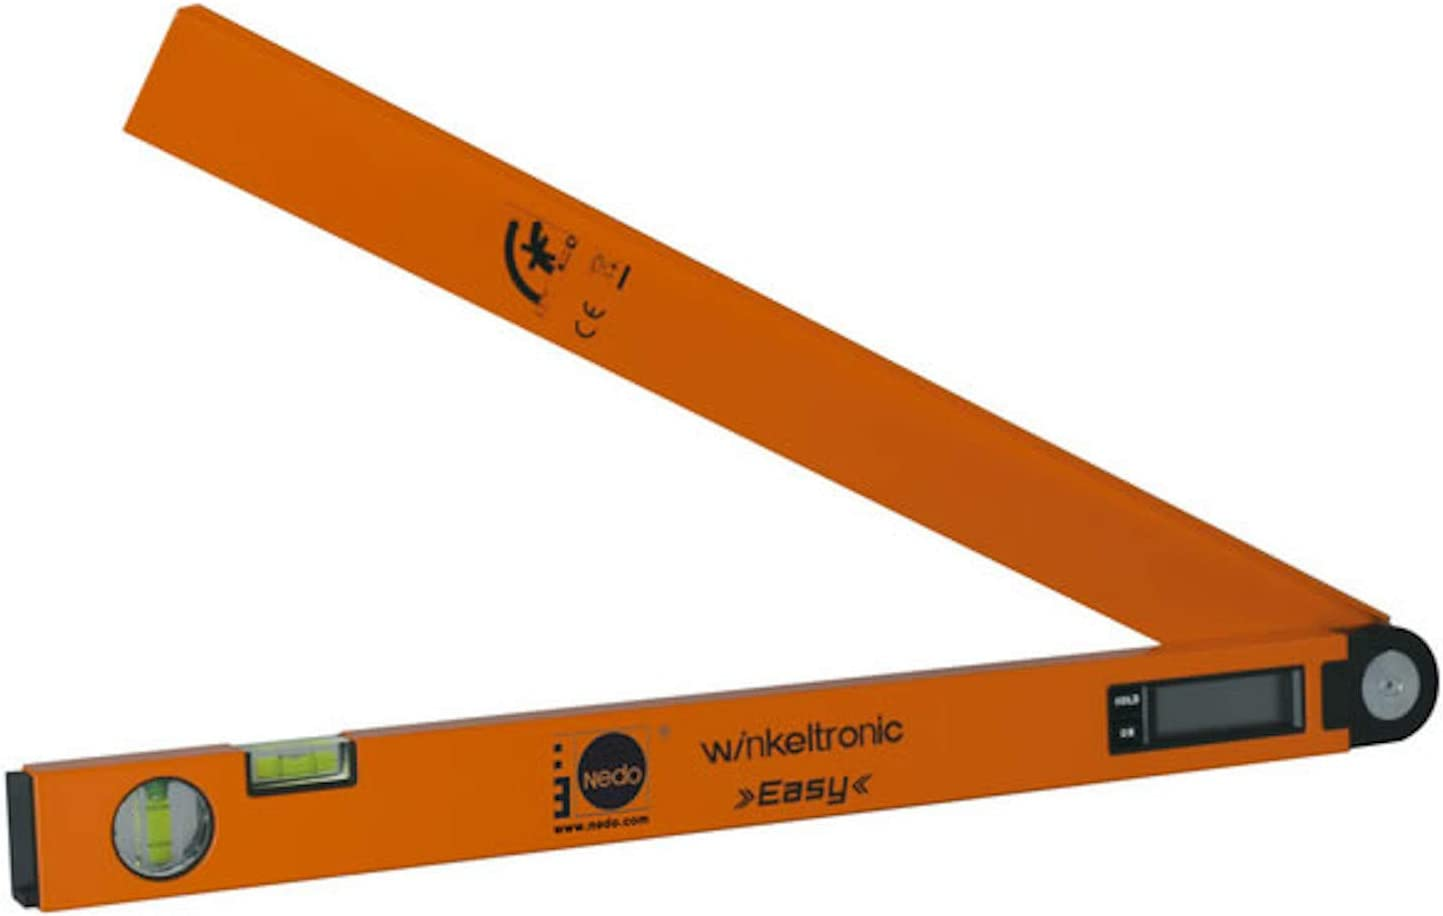 DEWEPRO Zollstock 2m Schenkell/änge 400mm inkl NEDO/® Winkeltronic Easy 400 Elektronischer Winkelmesser